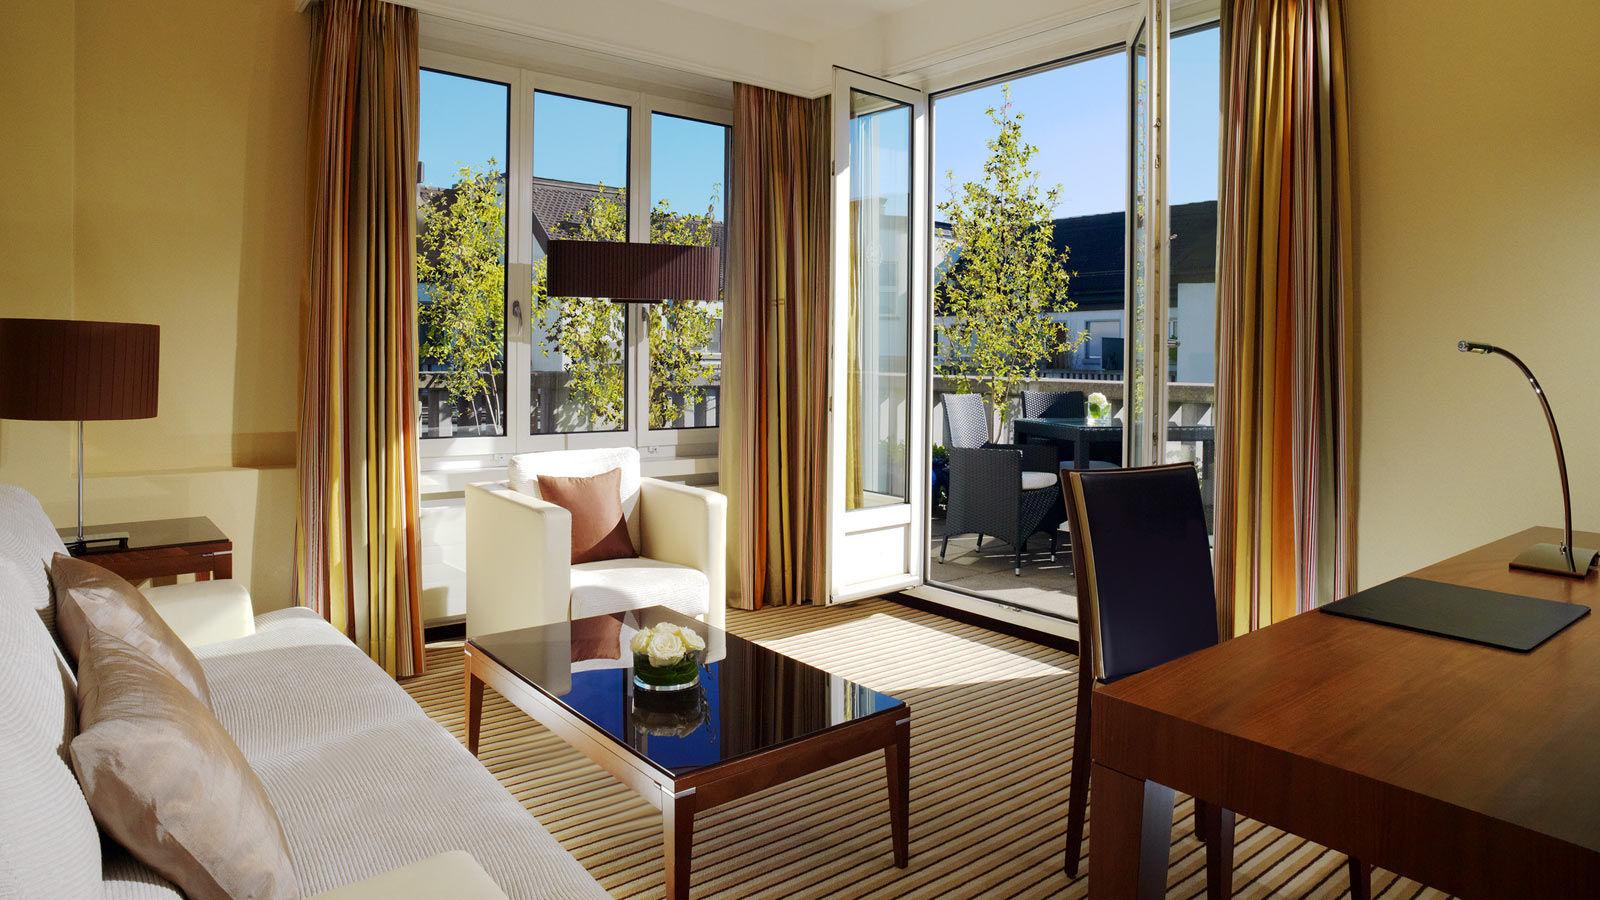 Sheraton-Zrich-Neues-Schloss-Hotel-Senior-Suite3